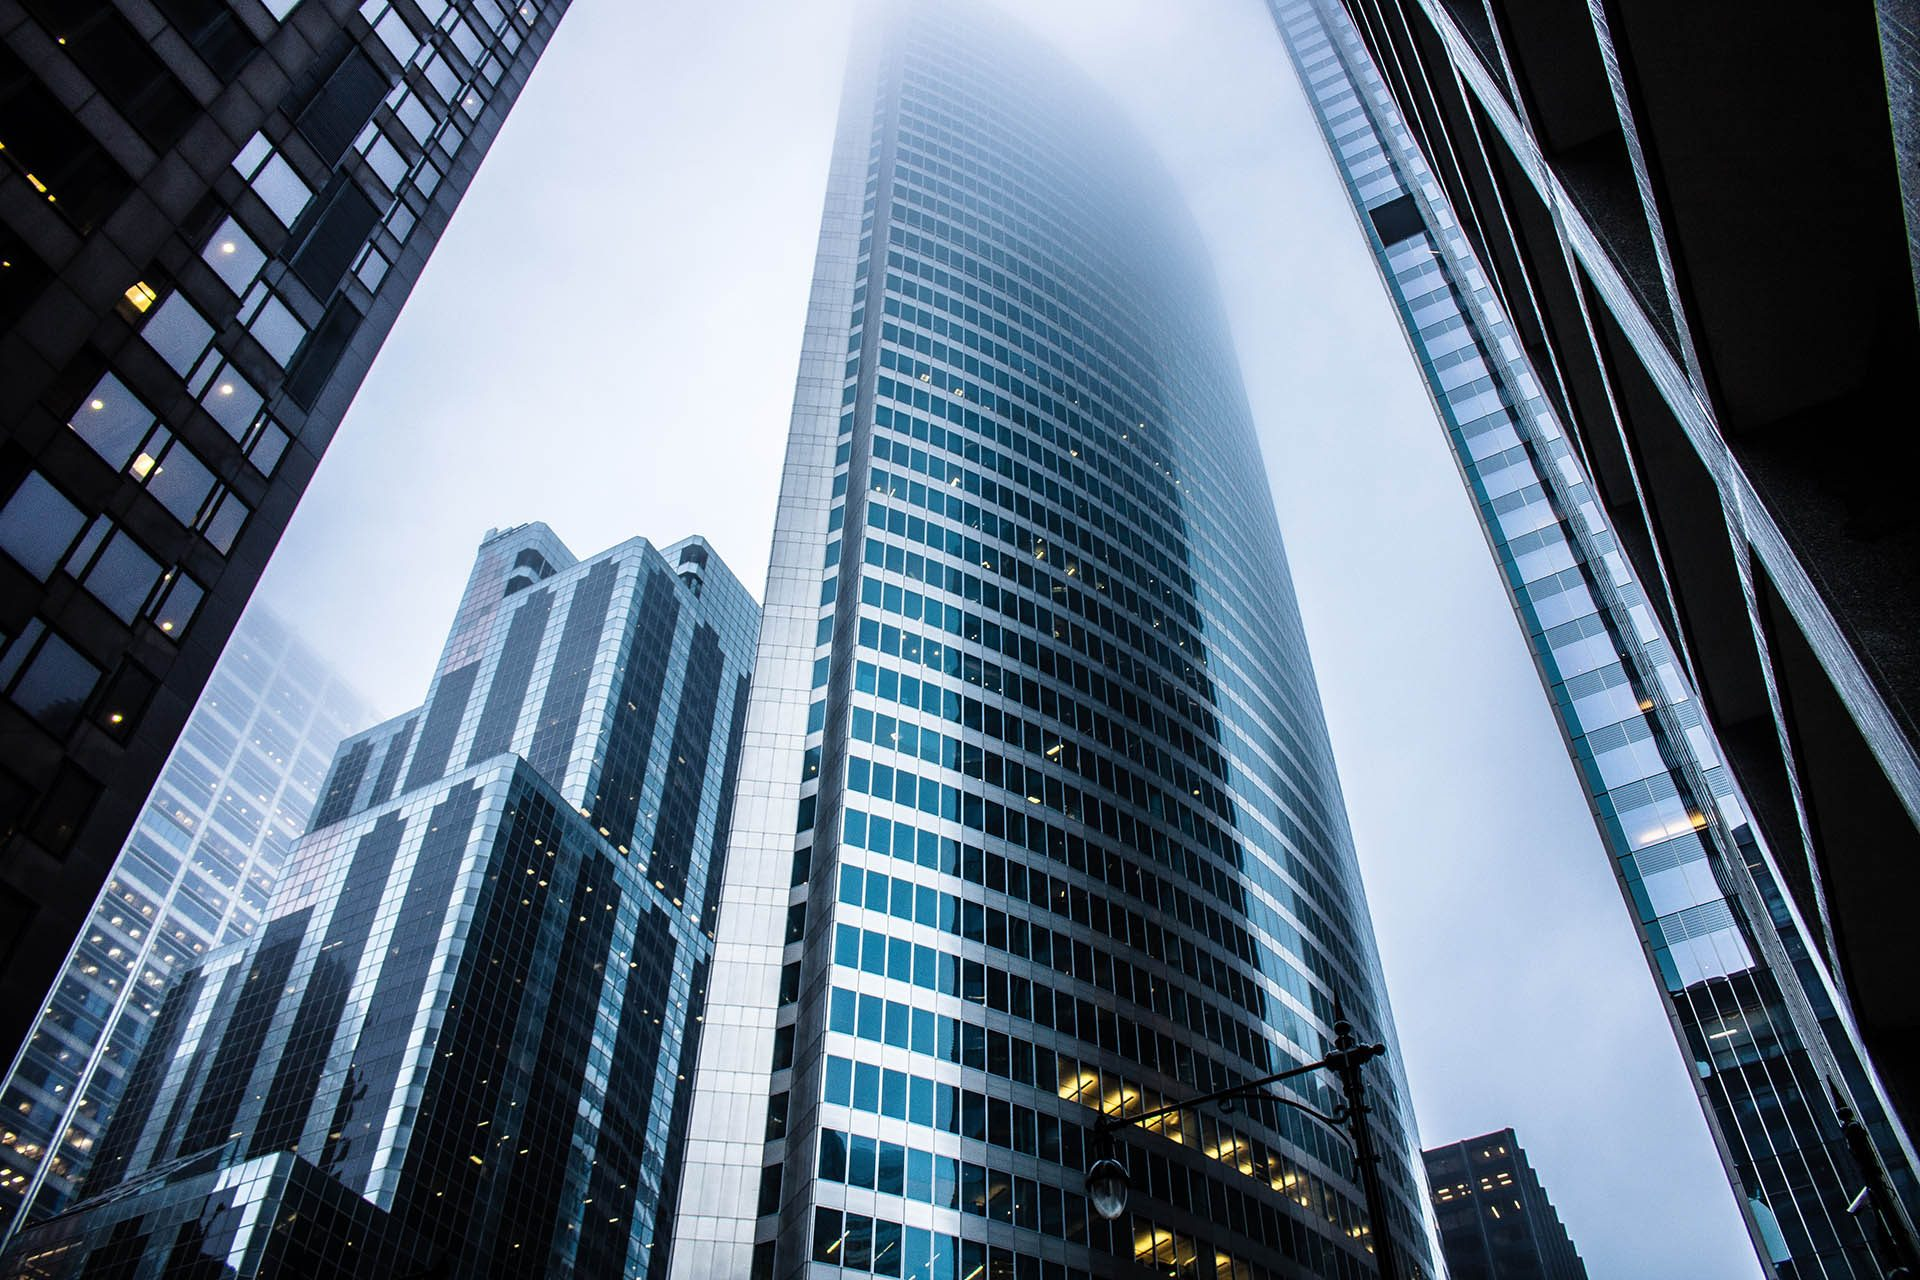 architectural-design-architecture-buildings-936722-1920x1280